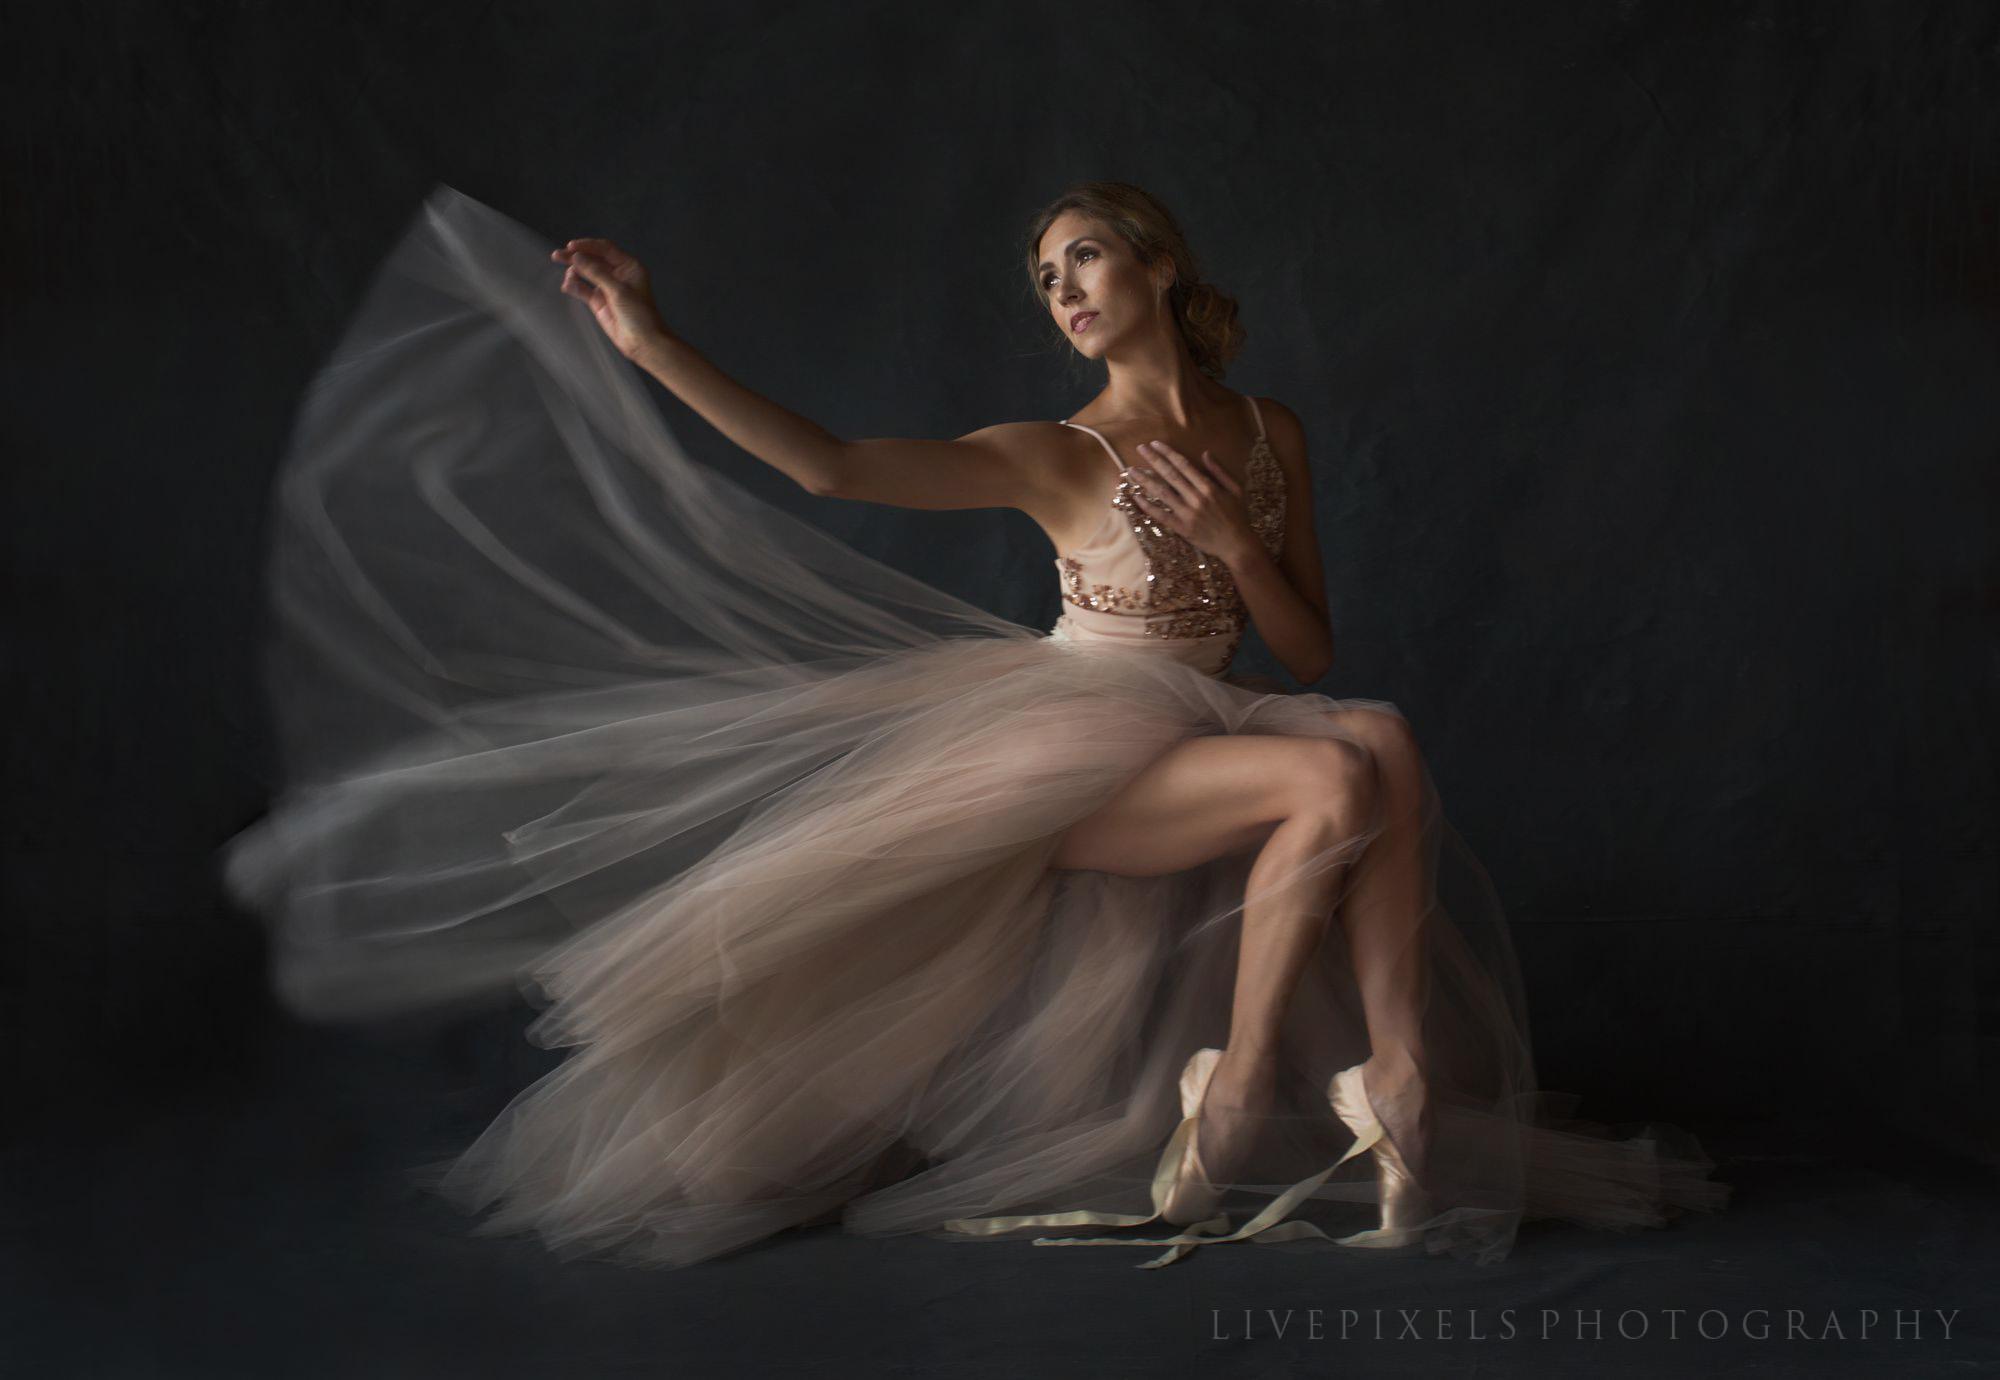 Toronto Ballet Dancer Elegant Portrait - Livepixels Photography, Toronto / livepixelsphotography.com